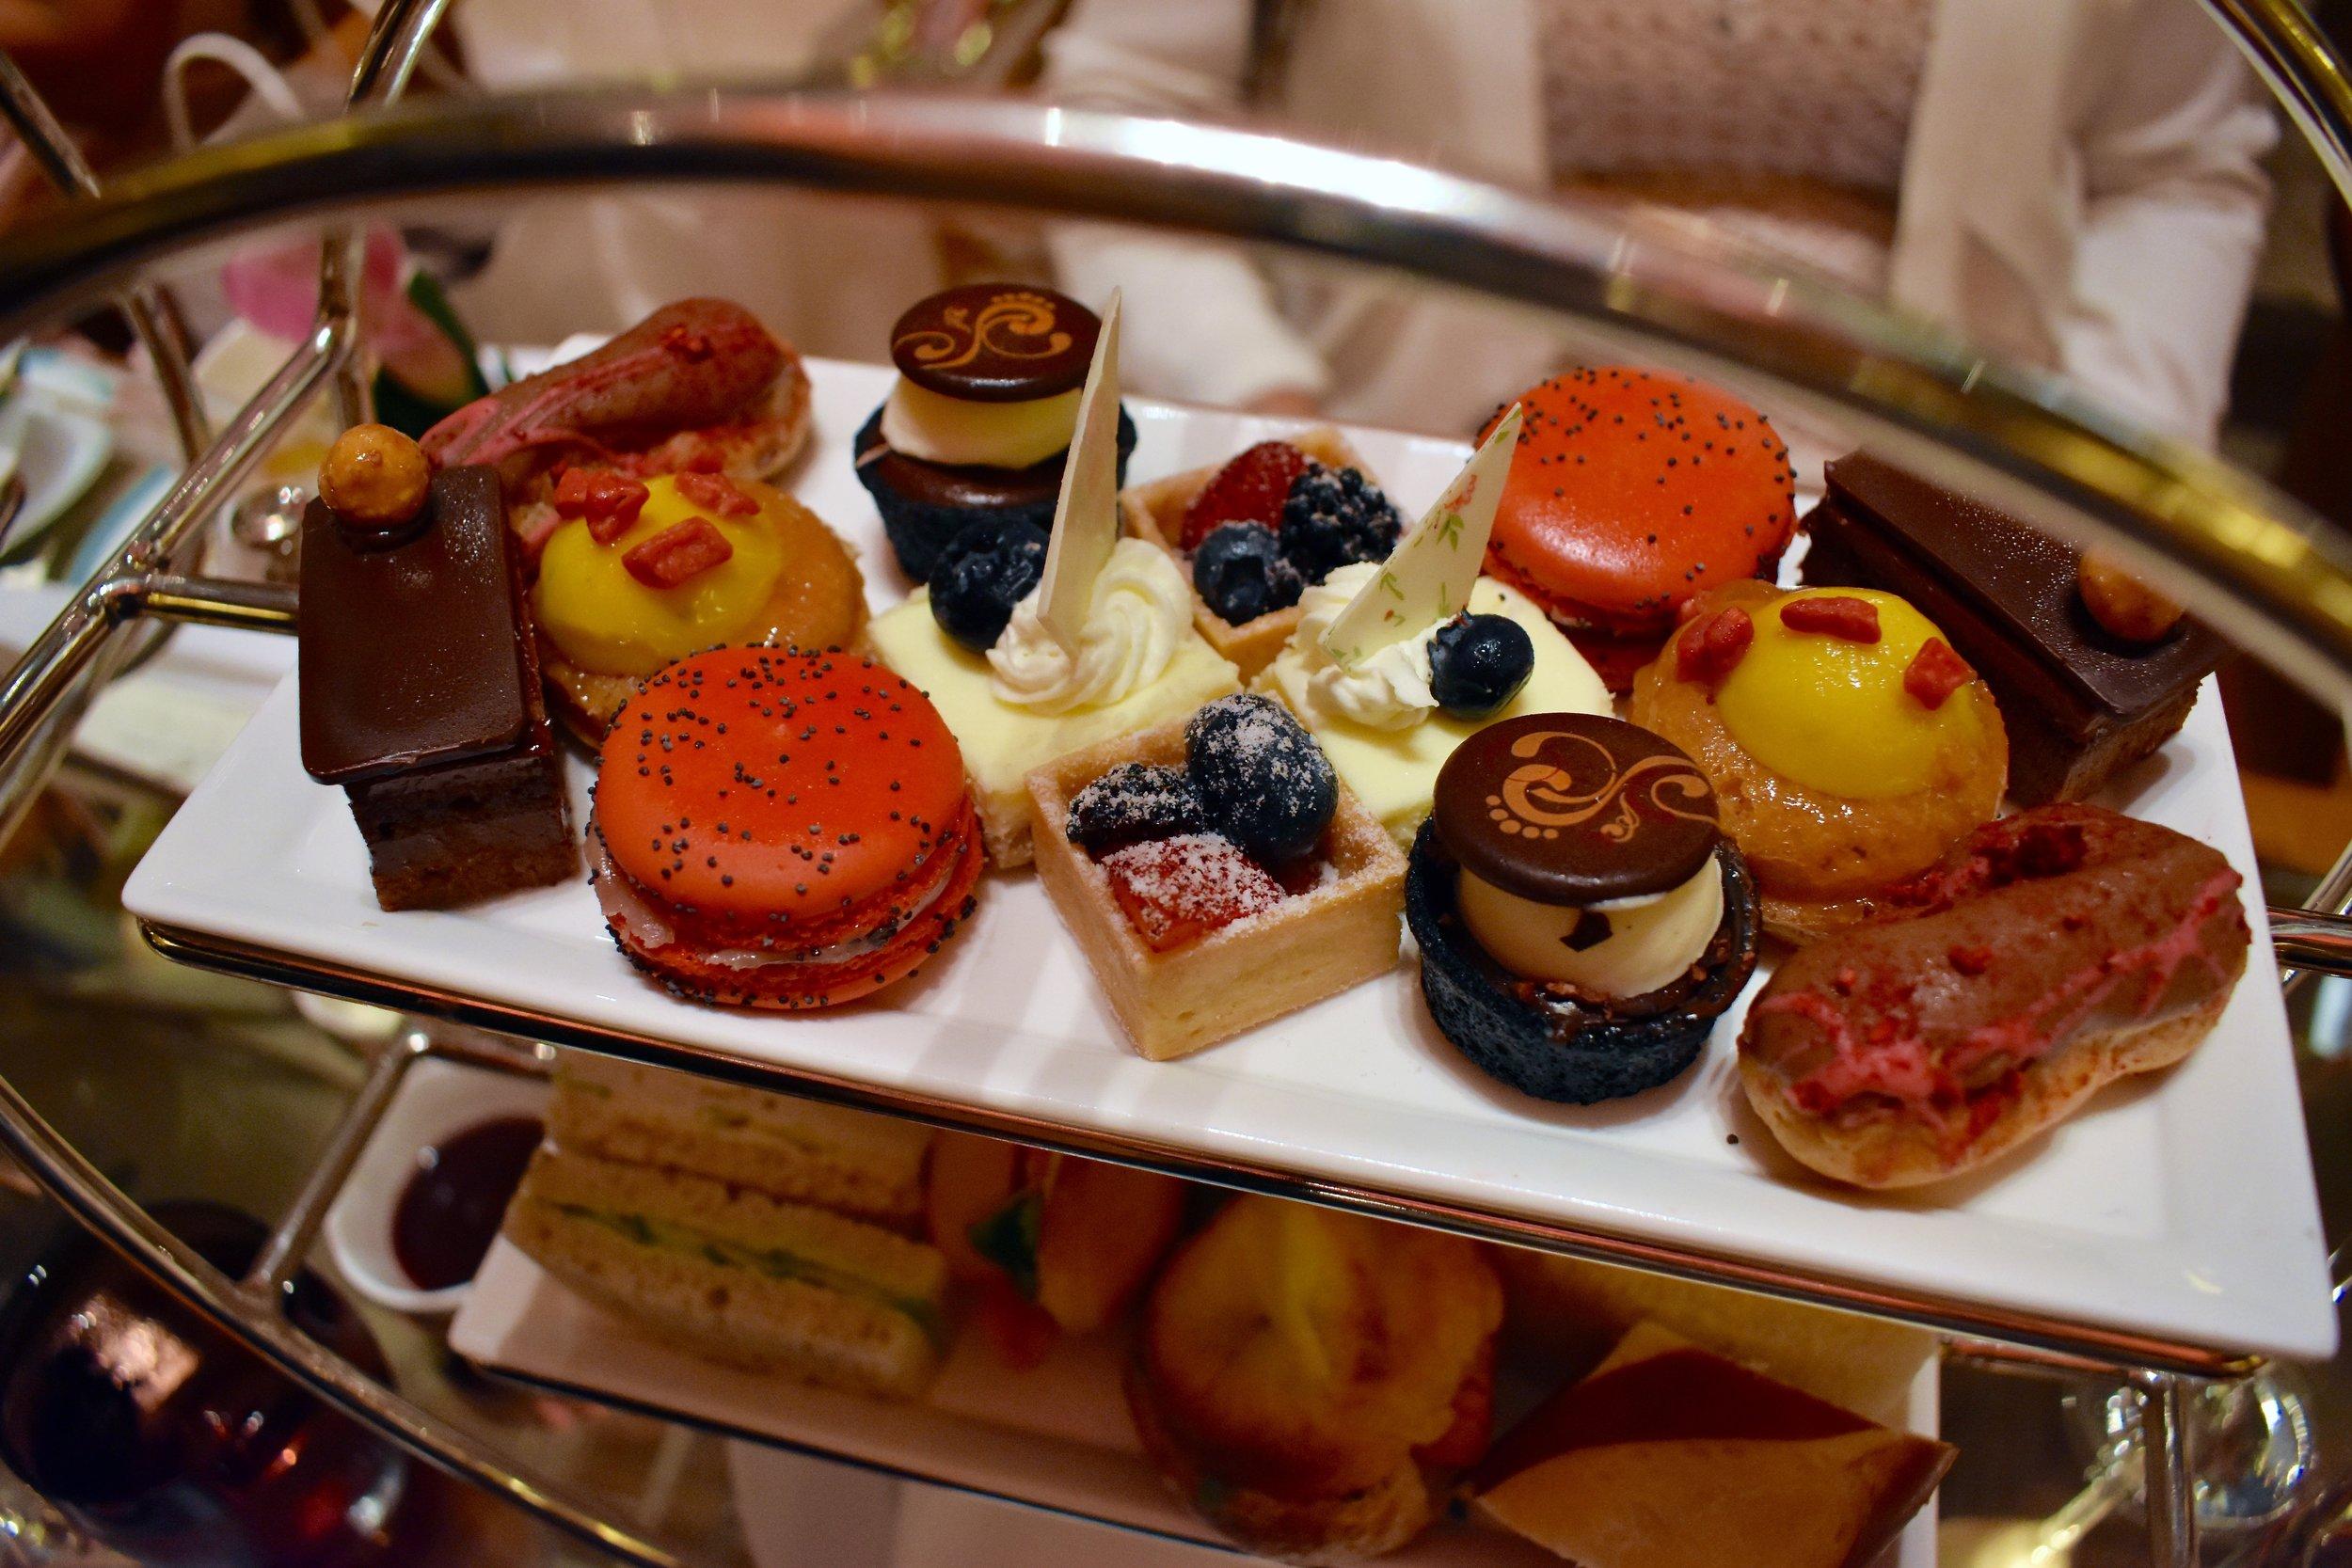 Sweet treats served during Tea.